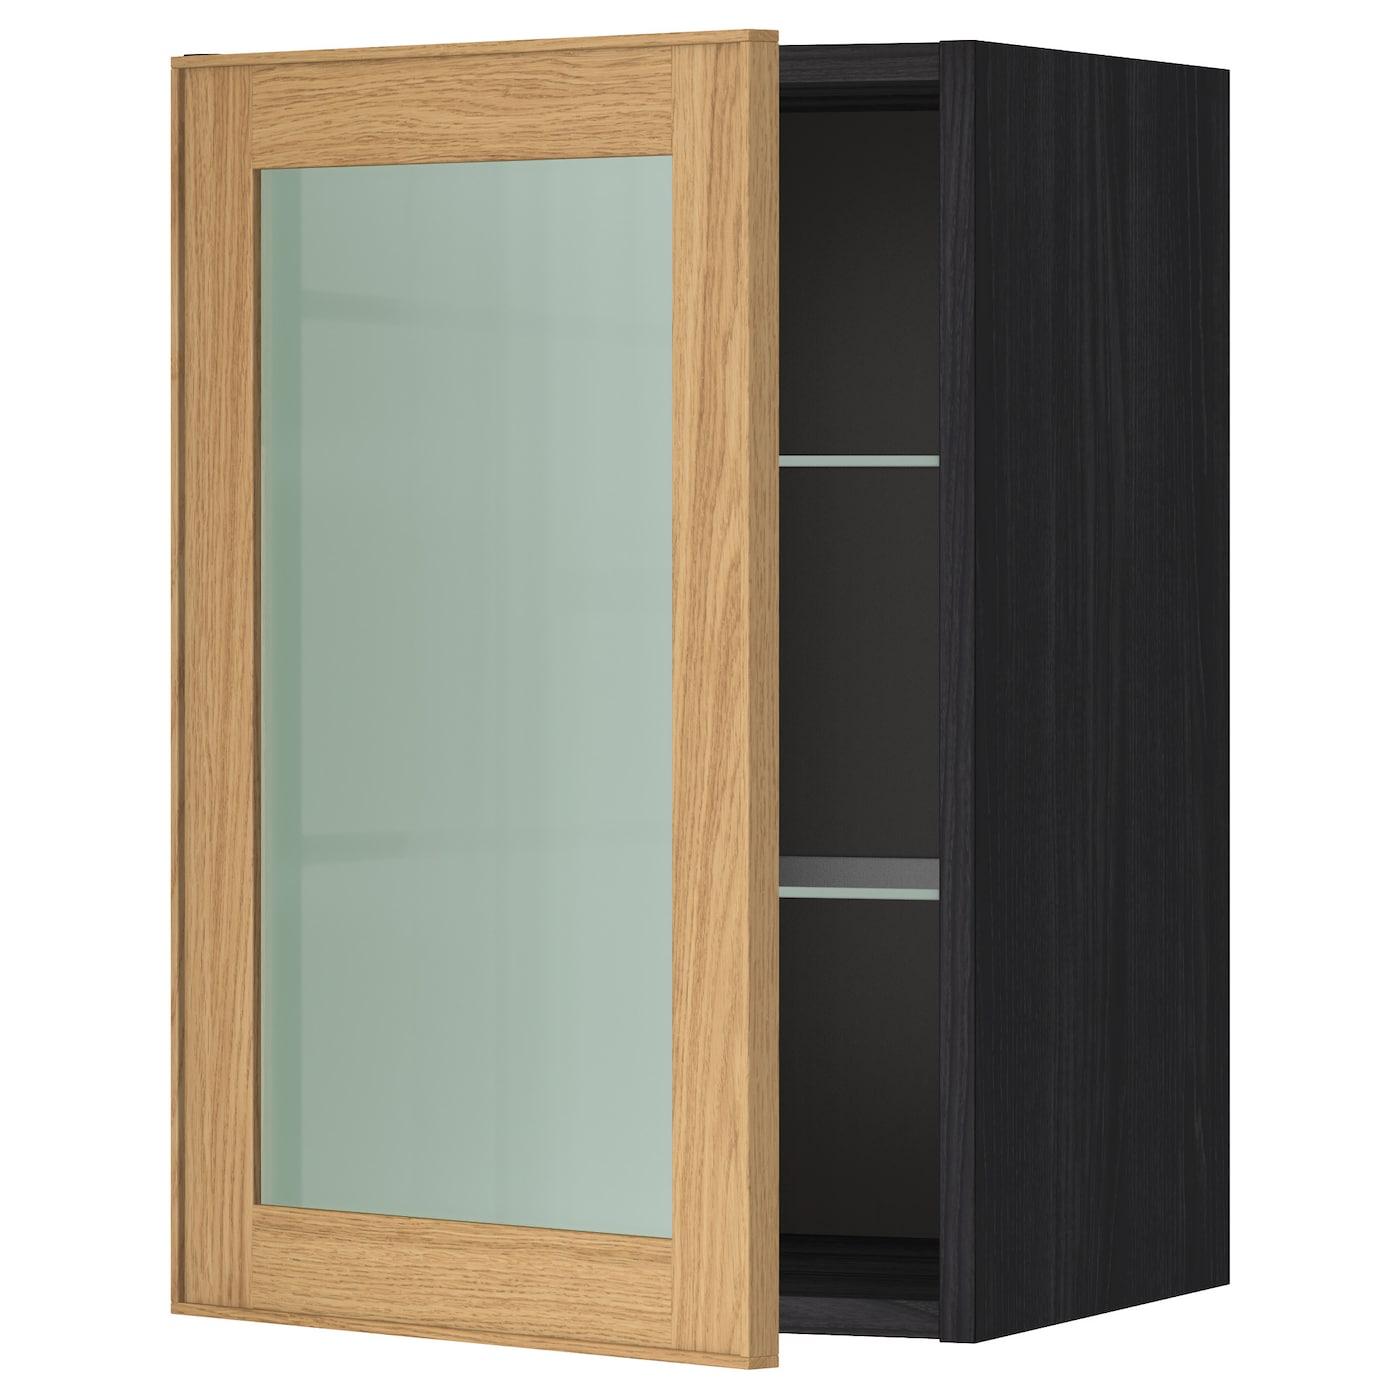 Kitchen Wall Cabinets | IKEA Ireland